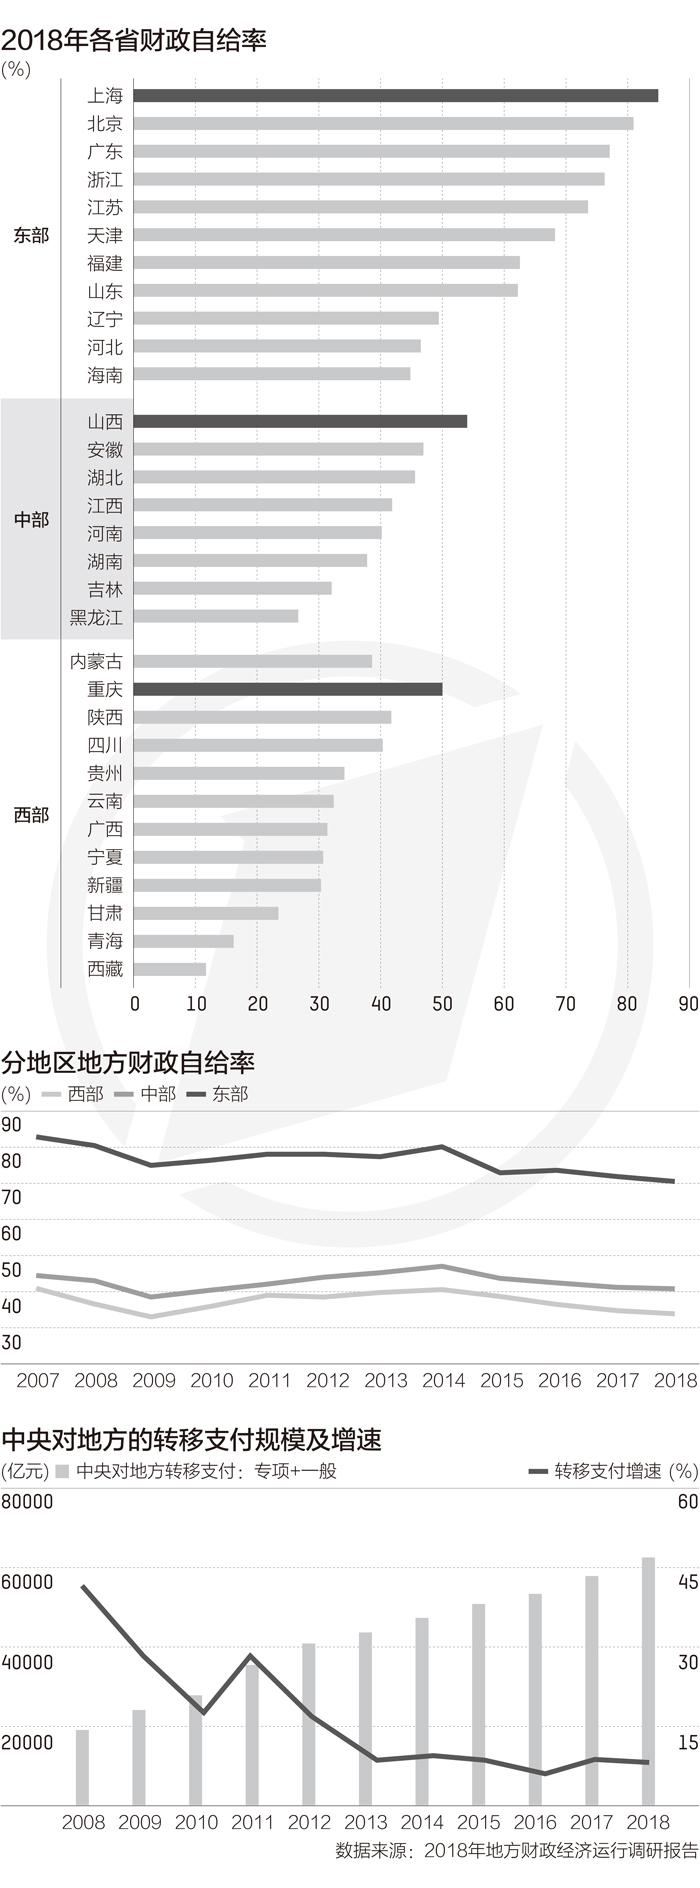 <b>31省份财政自给率差异大 中央转移支付依赖度上升</b>